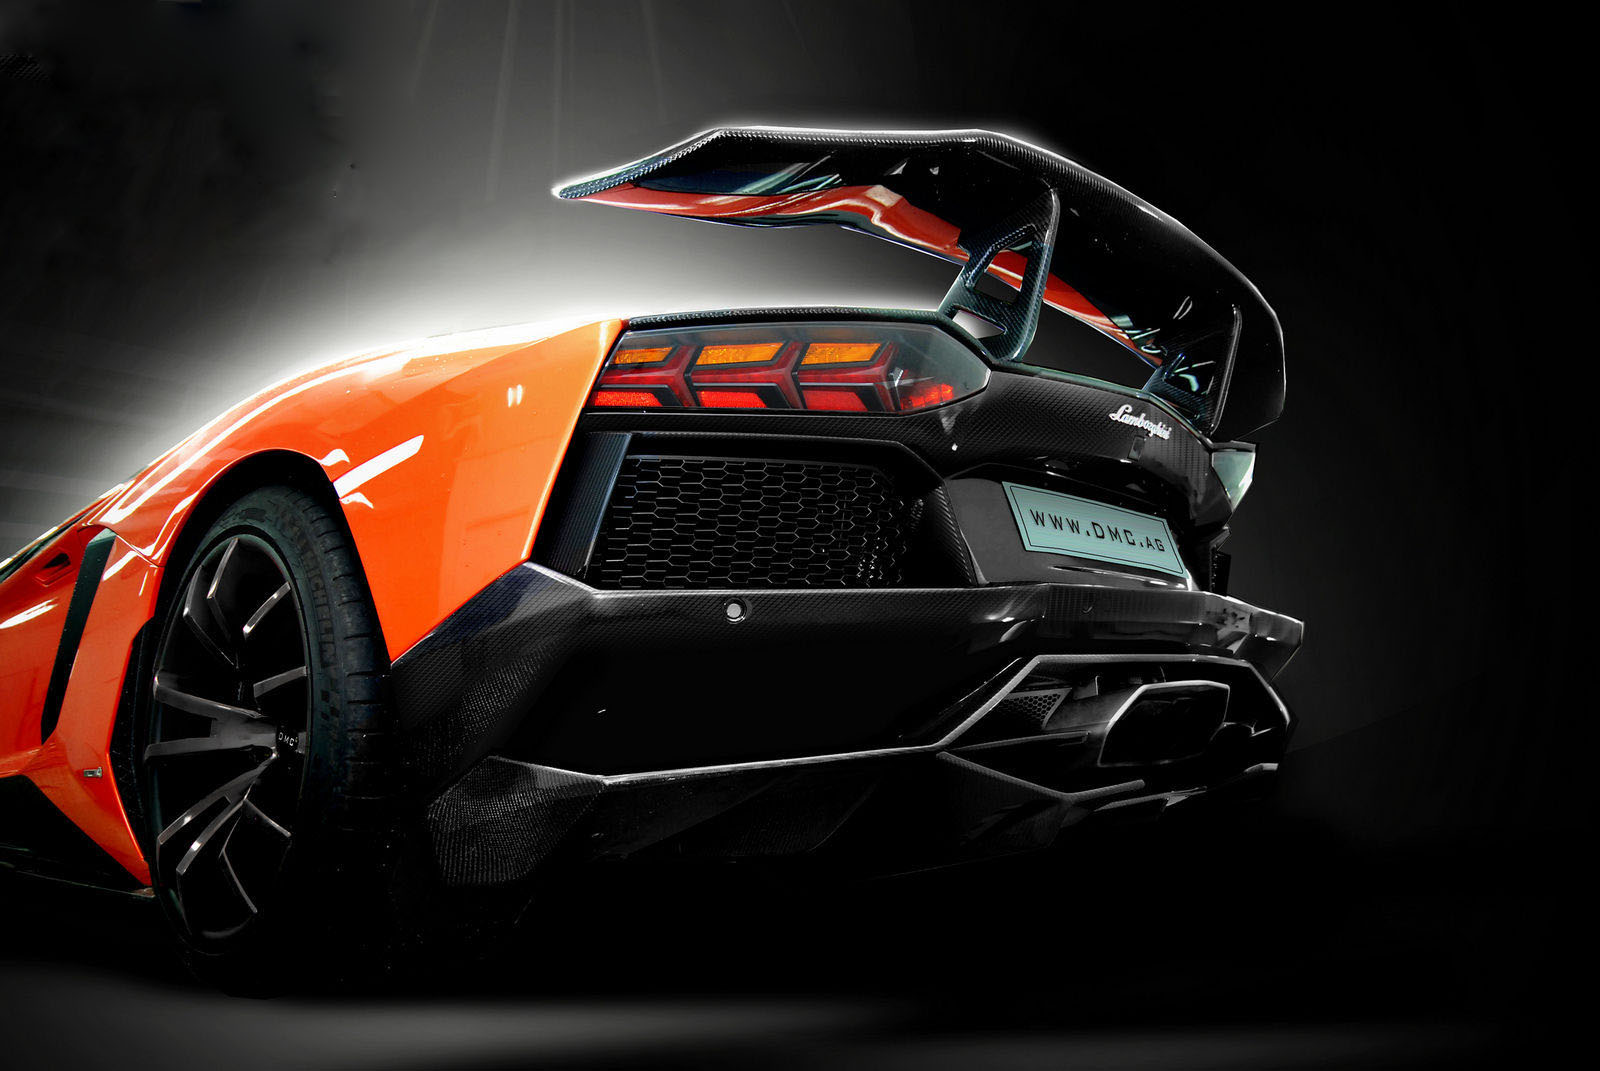 car in Lamborghini Aventador LP900 SV Limited Edition by DMC Tuning